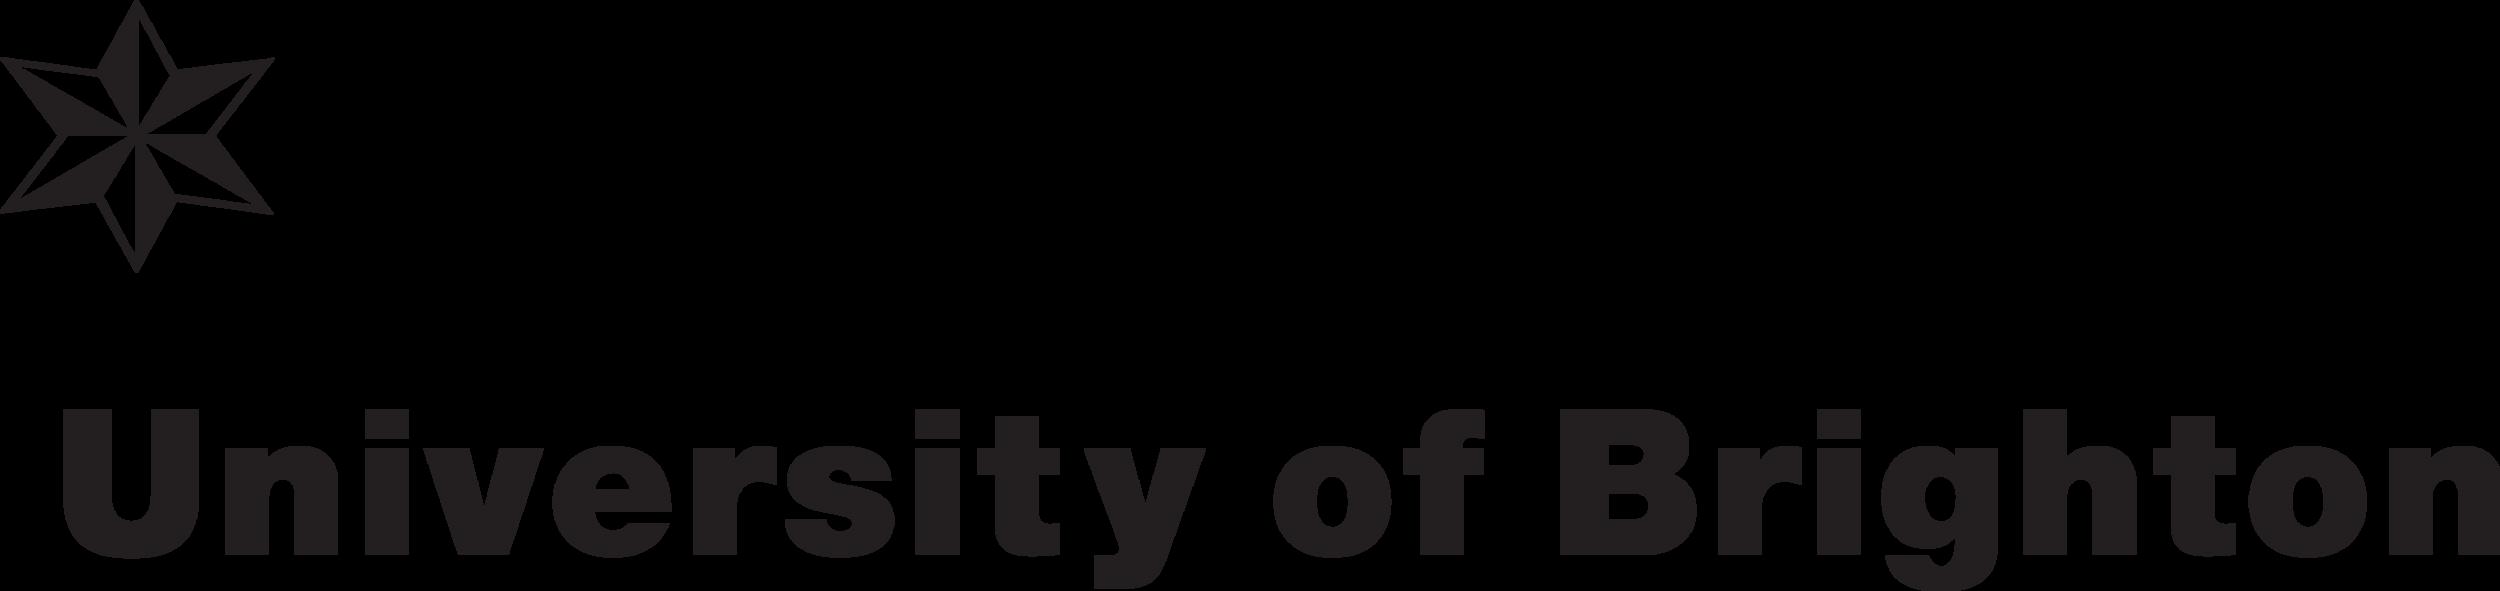 UoB-logo-Illustrator-Black.png